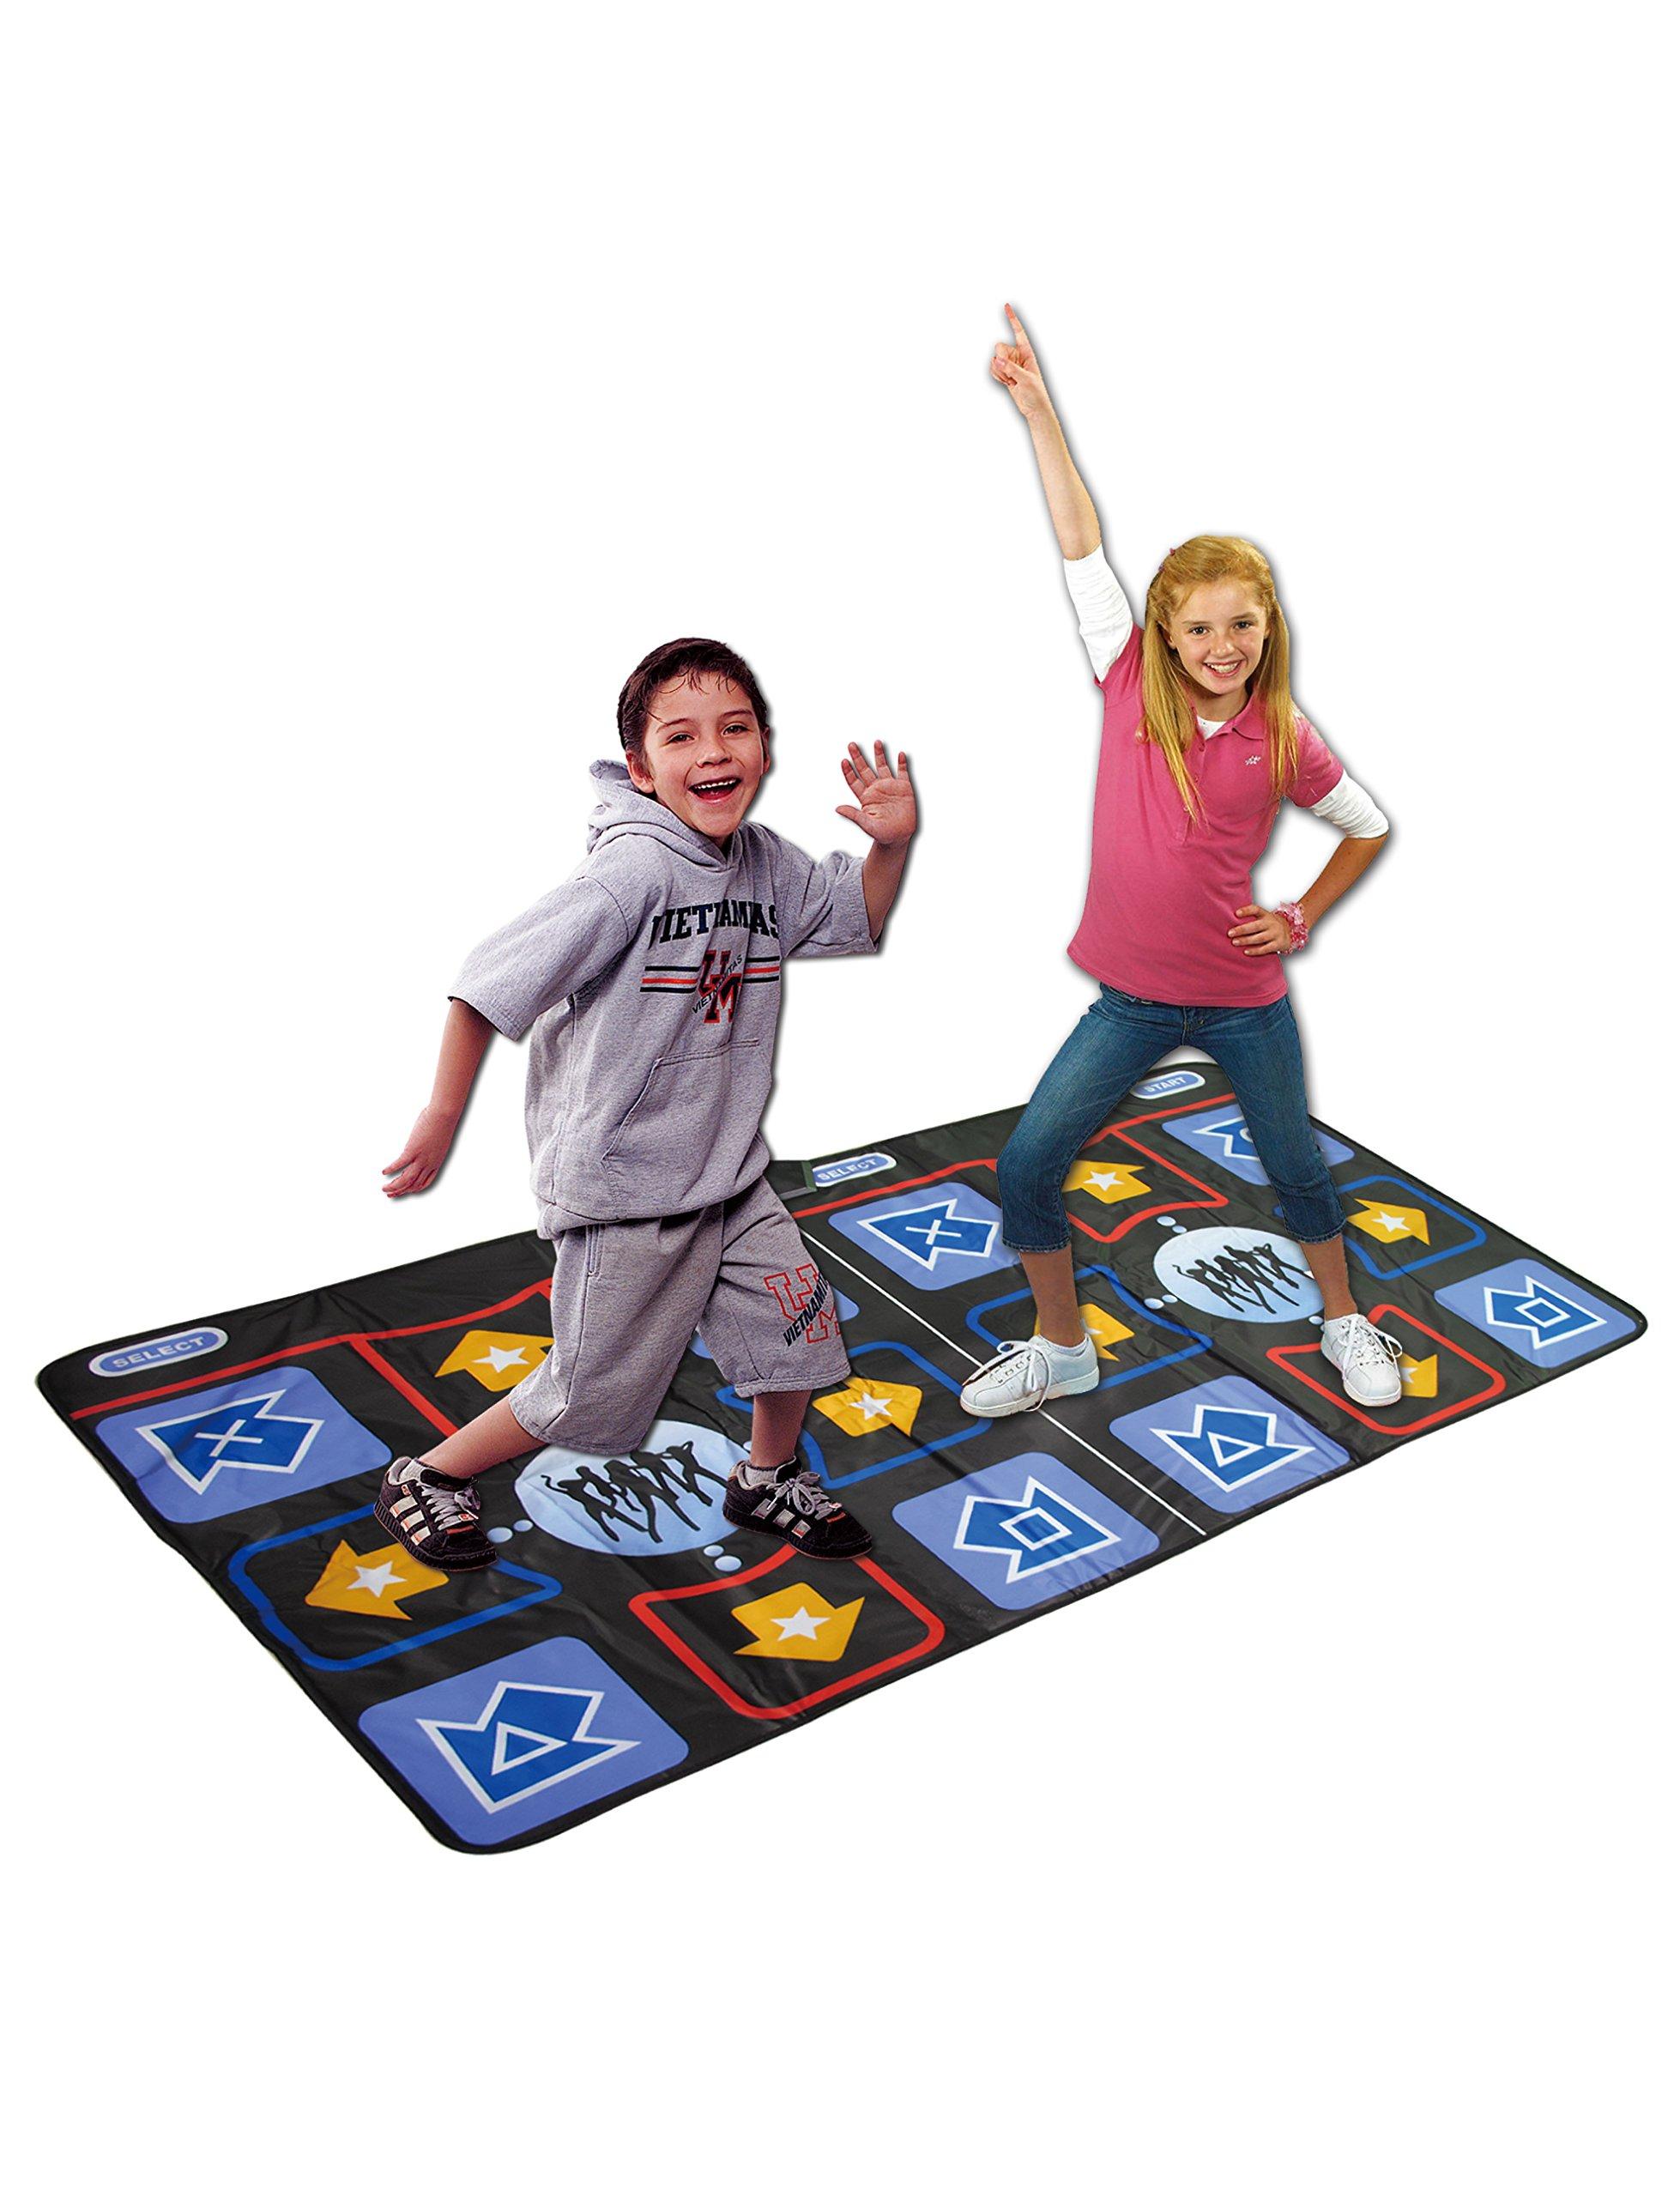 WOLSEN Non-slip & Non-toxic Durable Dual Playing TV Dance Mat with high-elastic EVA foaming technics & 218 SONGS Showdown Plug N' Play Mat for TV